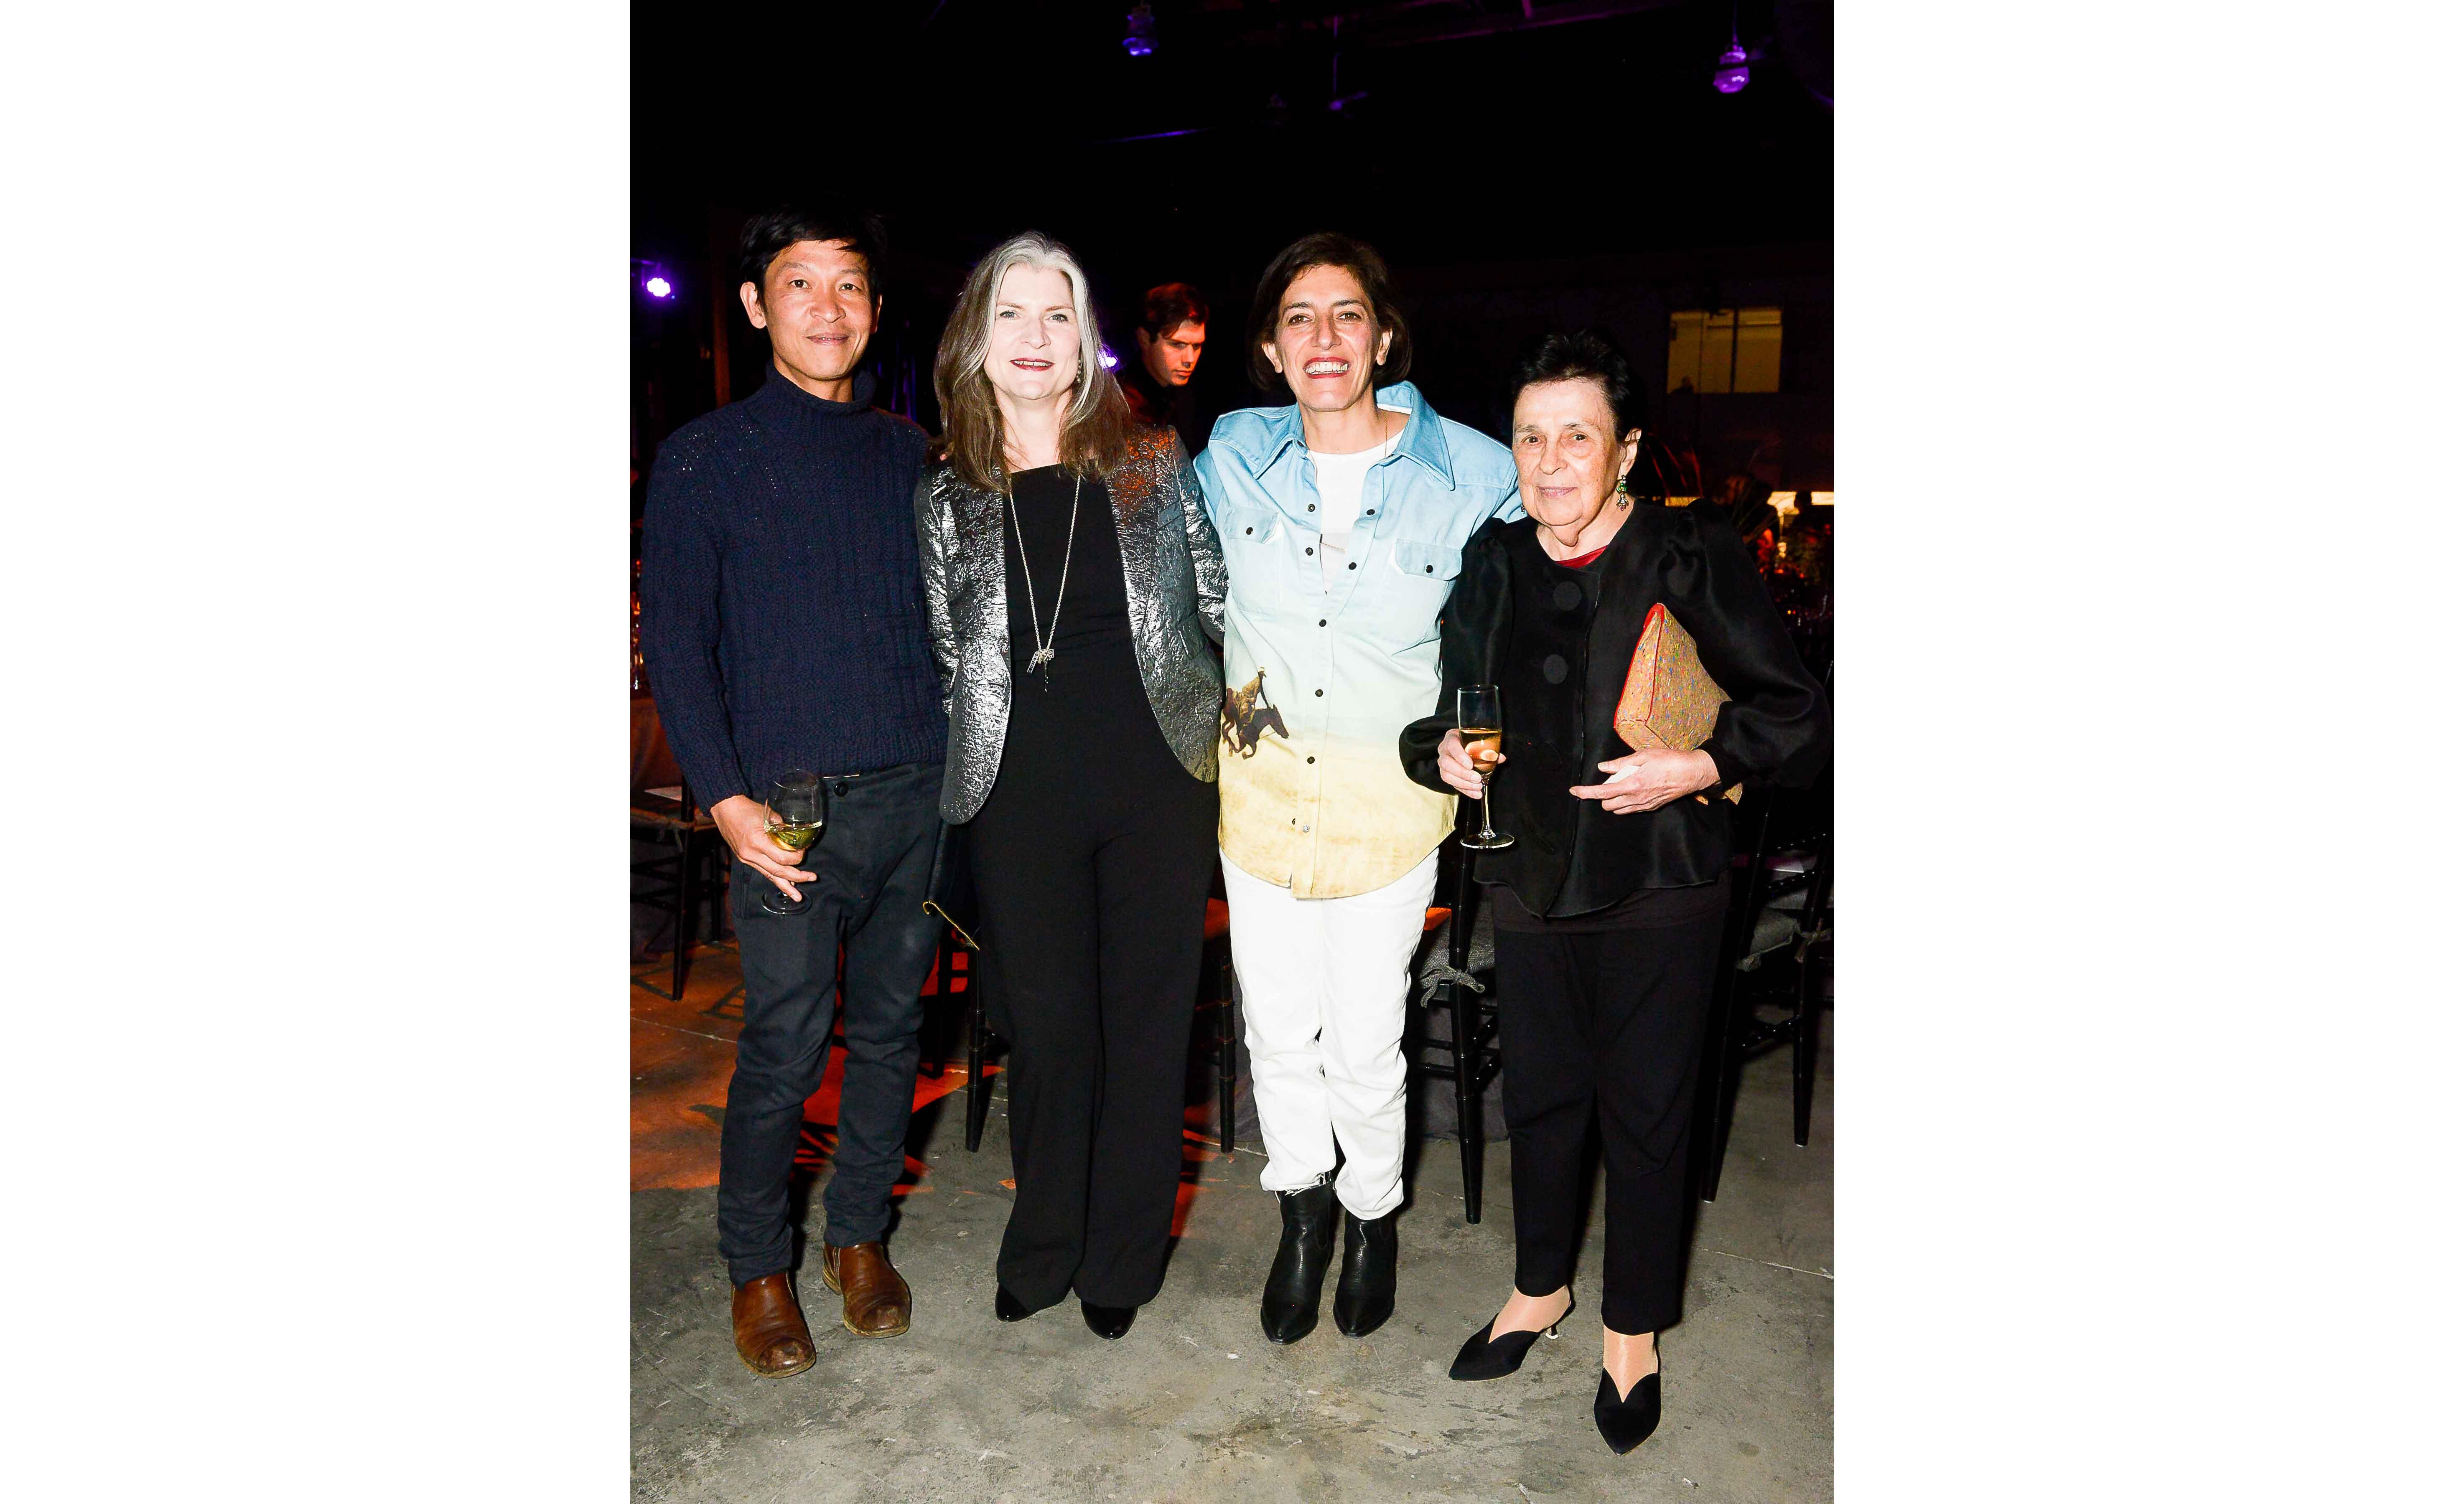 Danh Vo, Mary Ceruti, Nairy Baghramian and Marian Goodman